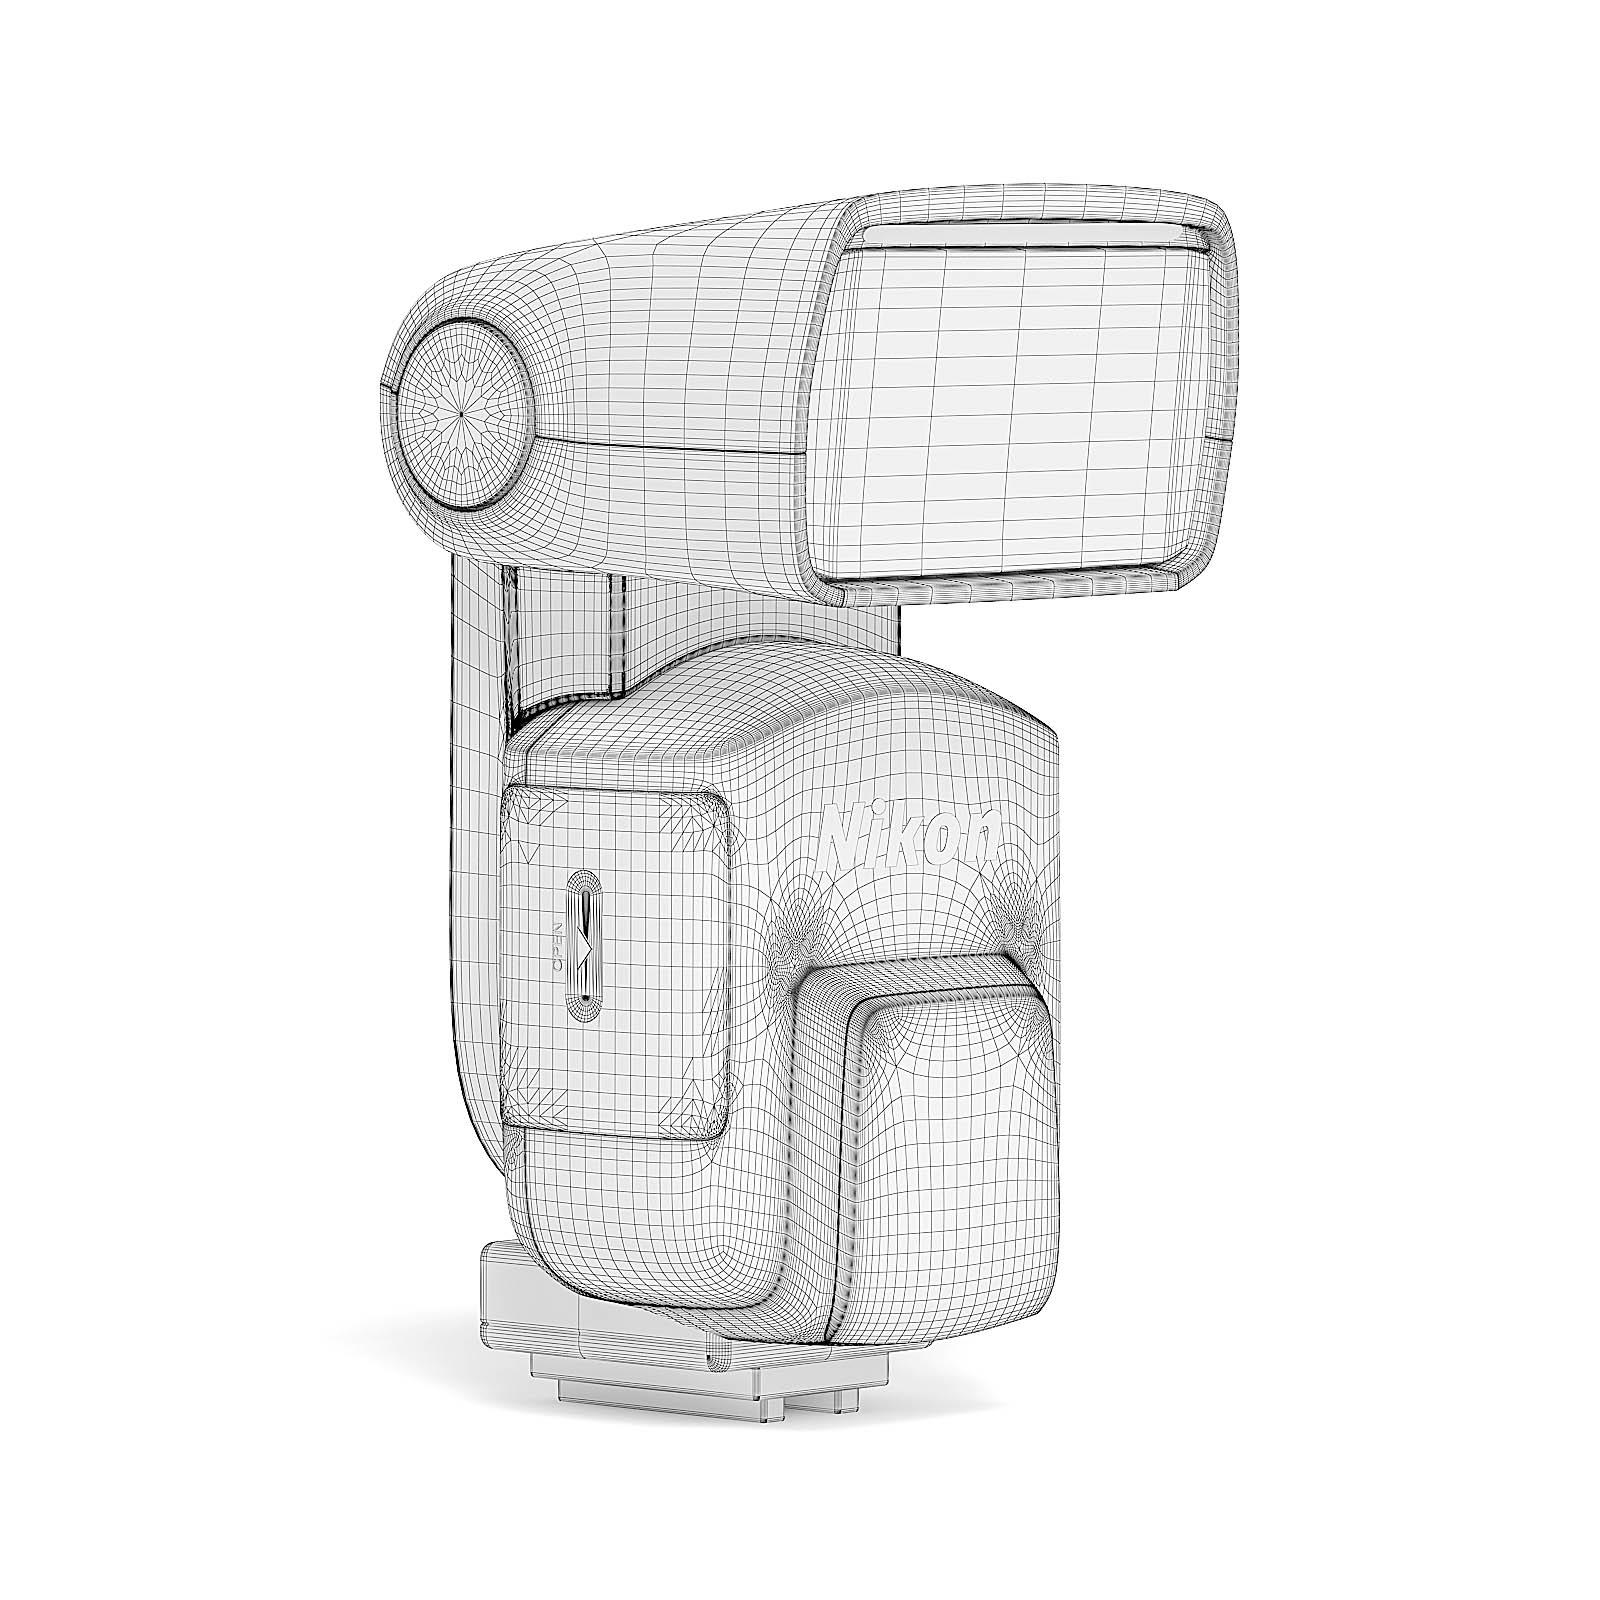 Camera Flash Lamp 3D Model